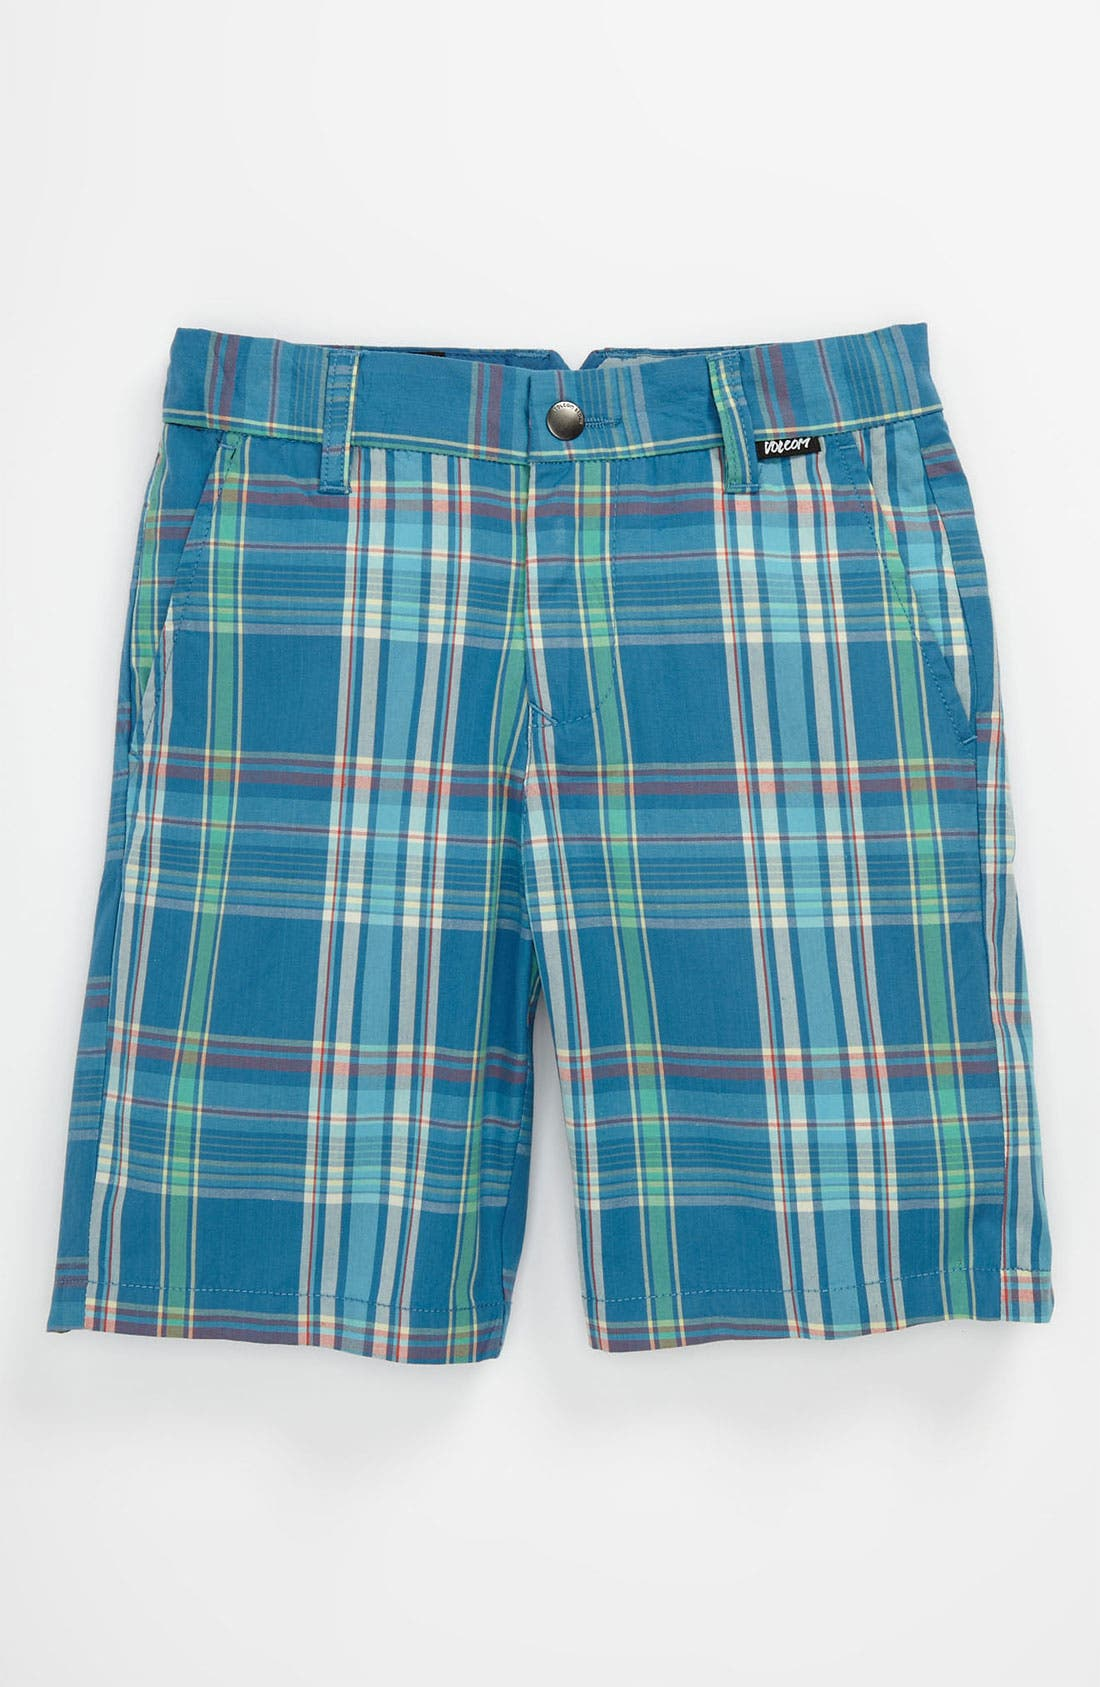 Main Image - Volcom 'Rushy' Plaid Shorts (Little Boys)